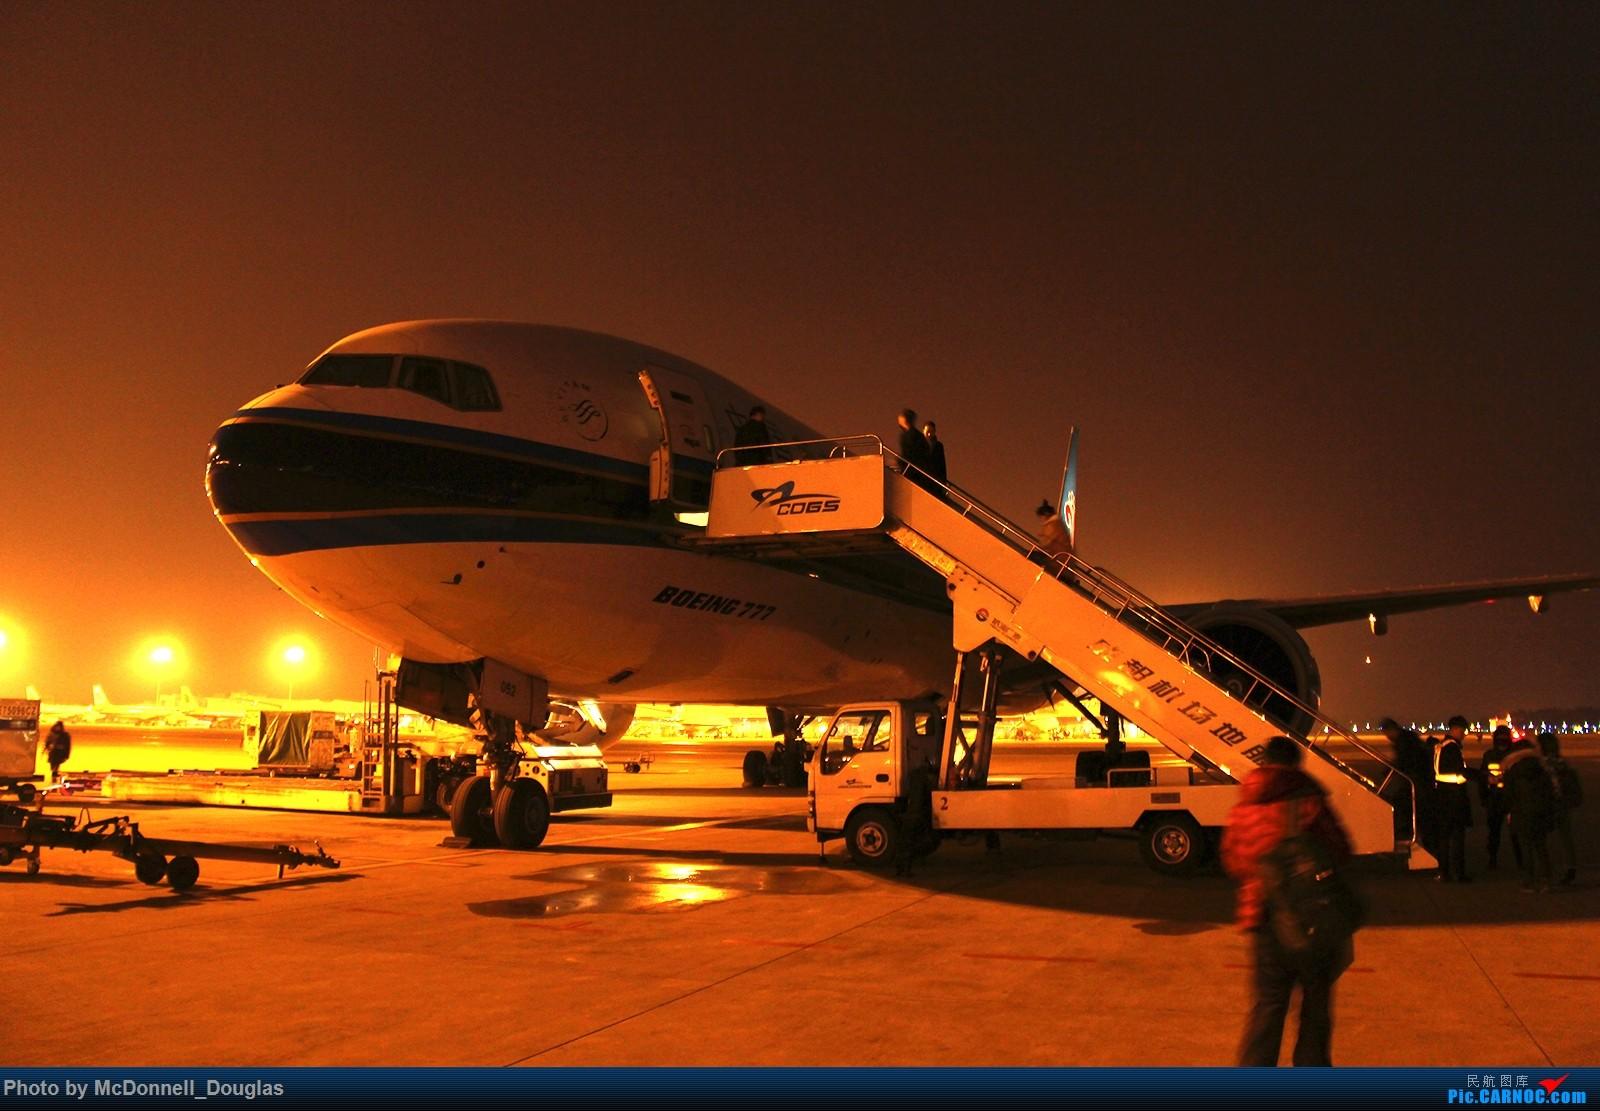 Re:[原创]【上海飞友会】【zc带你游天下(4)】不远千里飞跃喜马拉雅去看你,探寻高山另一边的神秘国度,和一群贫穷却快乐着的人们 BOEING 777-21B B-2052 中国成都双流国际机场